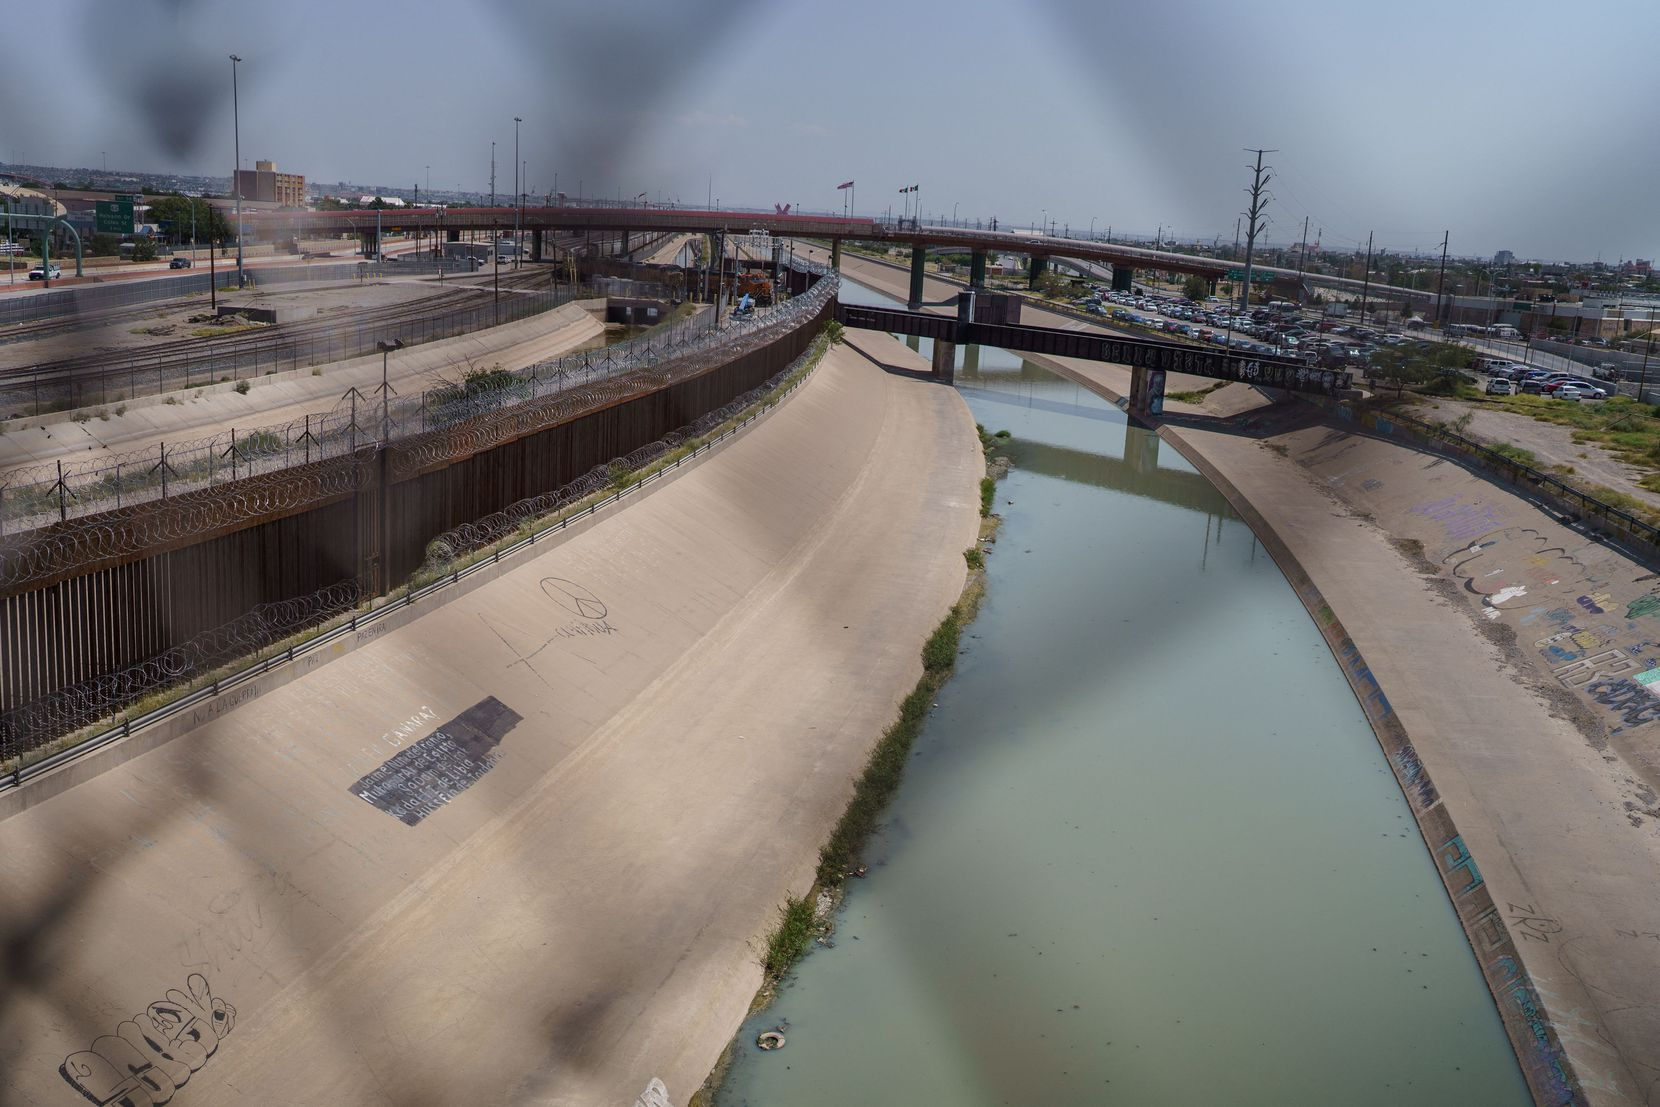 The Rio Grande, which marks the U.-Mexico border line, as it passes through El Paso-Ciudad Juarez, Chihuahua state, Mexico on September 9, 2021.